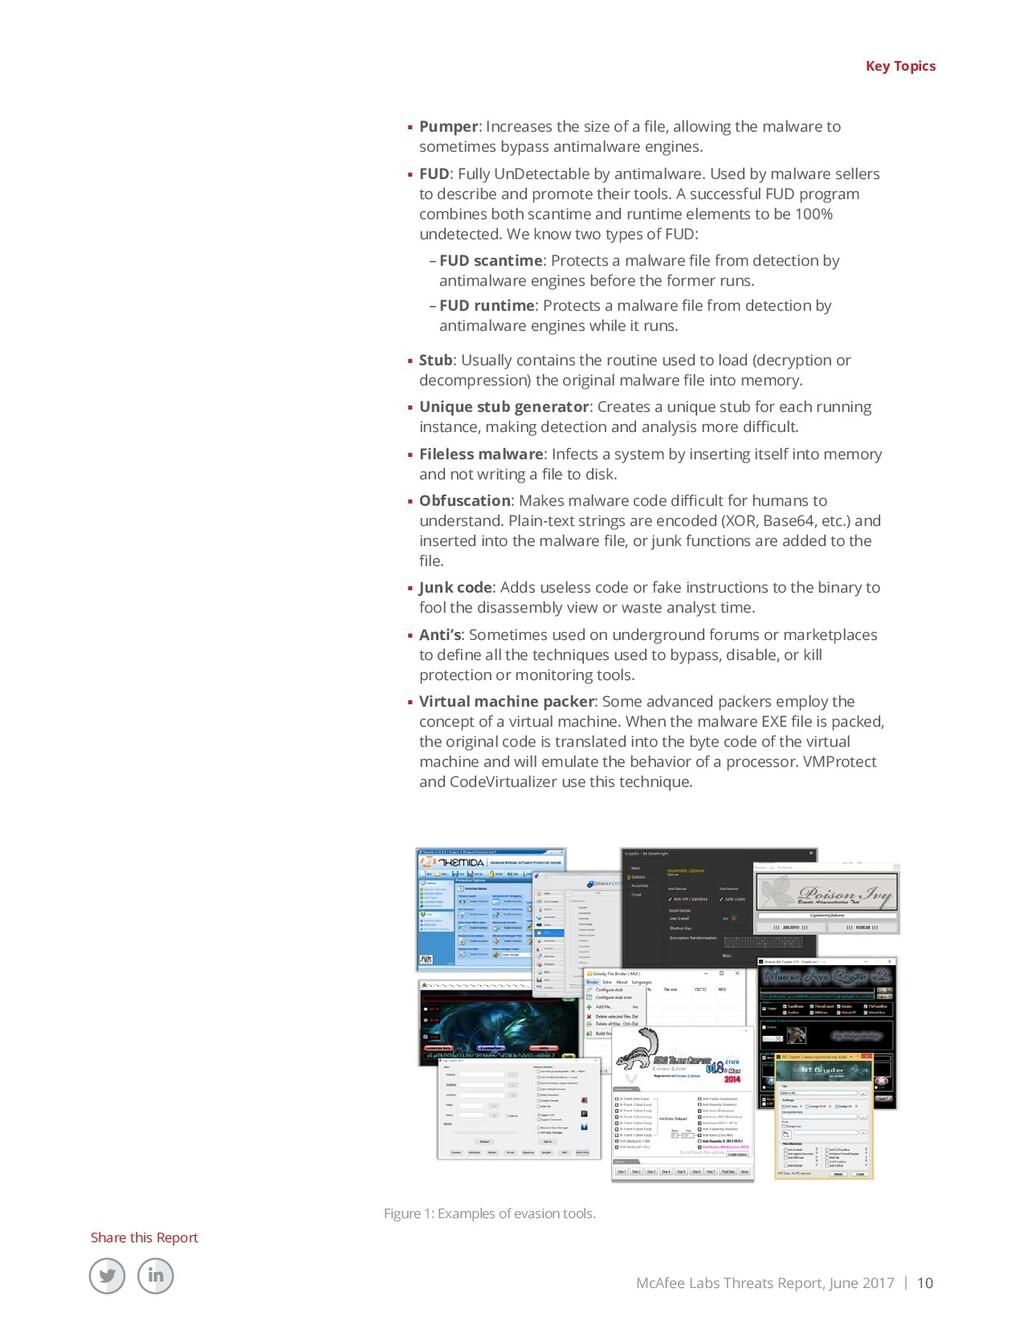 McAfee Labs Threats Report, June 2017 | 10 Shar...